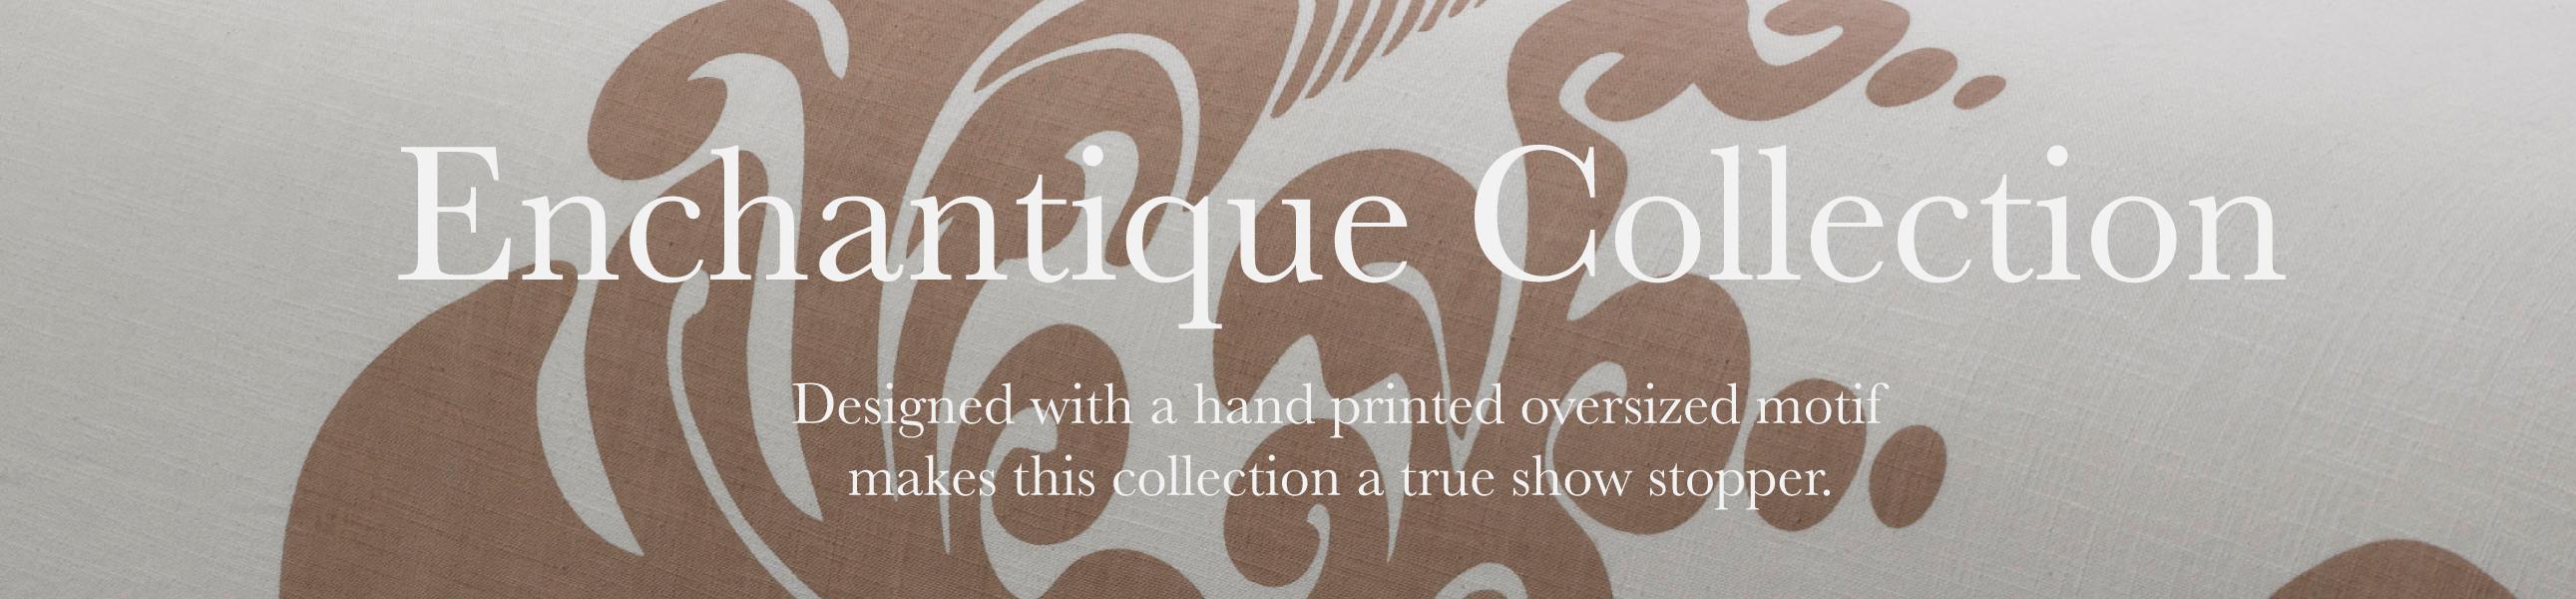 cd-enchantique-collection-banner-final.jpg